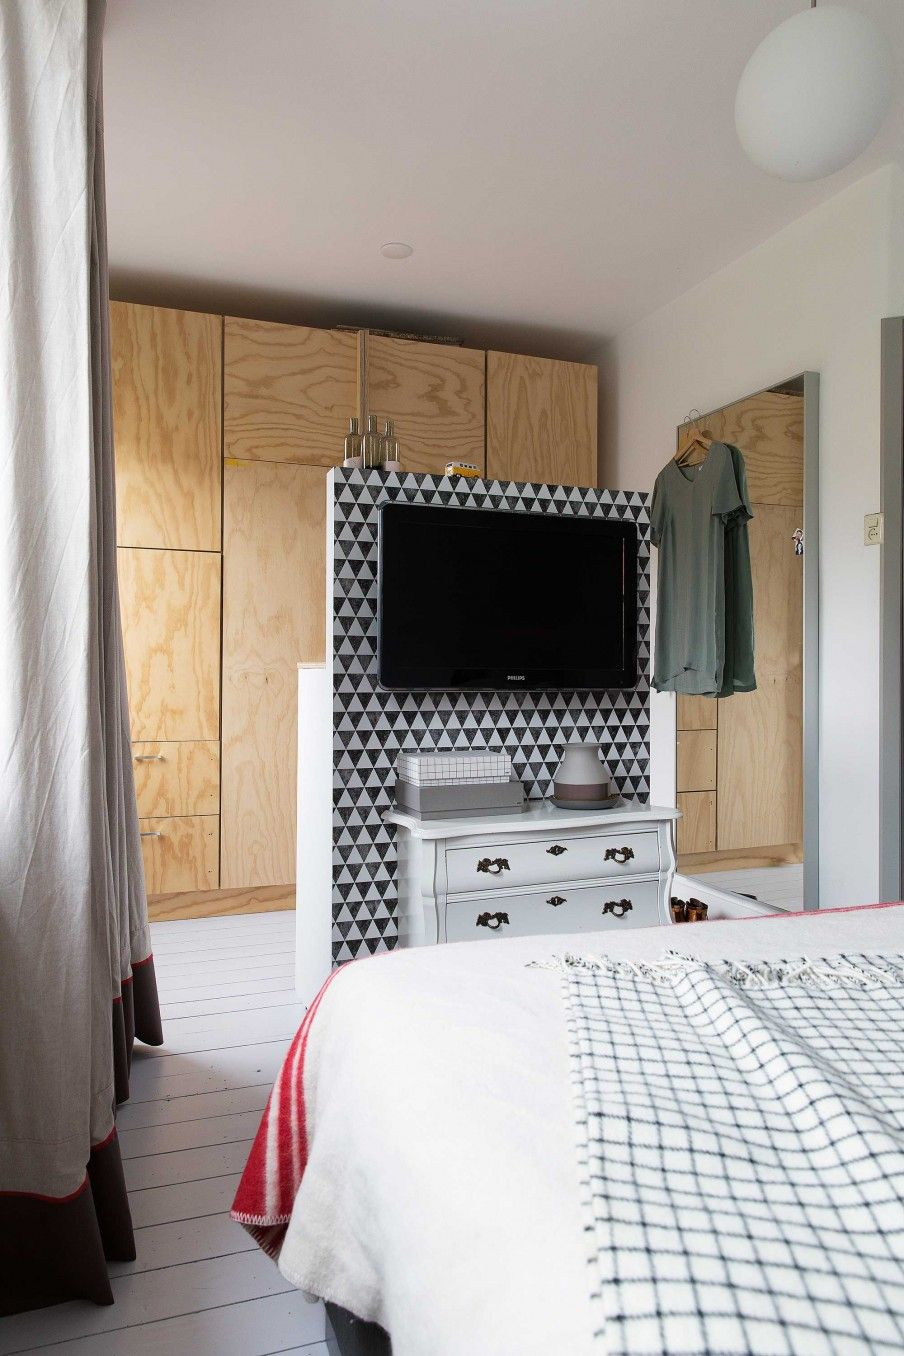 Slaapkamer bedroom vtwonen fotografie jansje klazinga